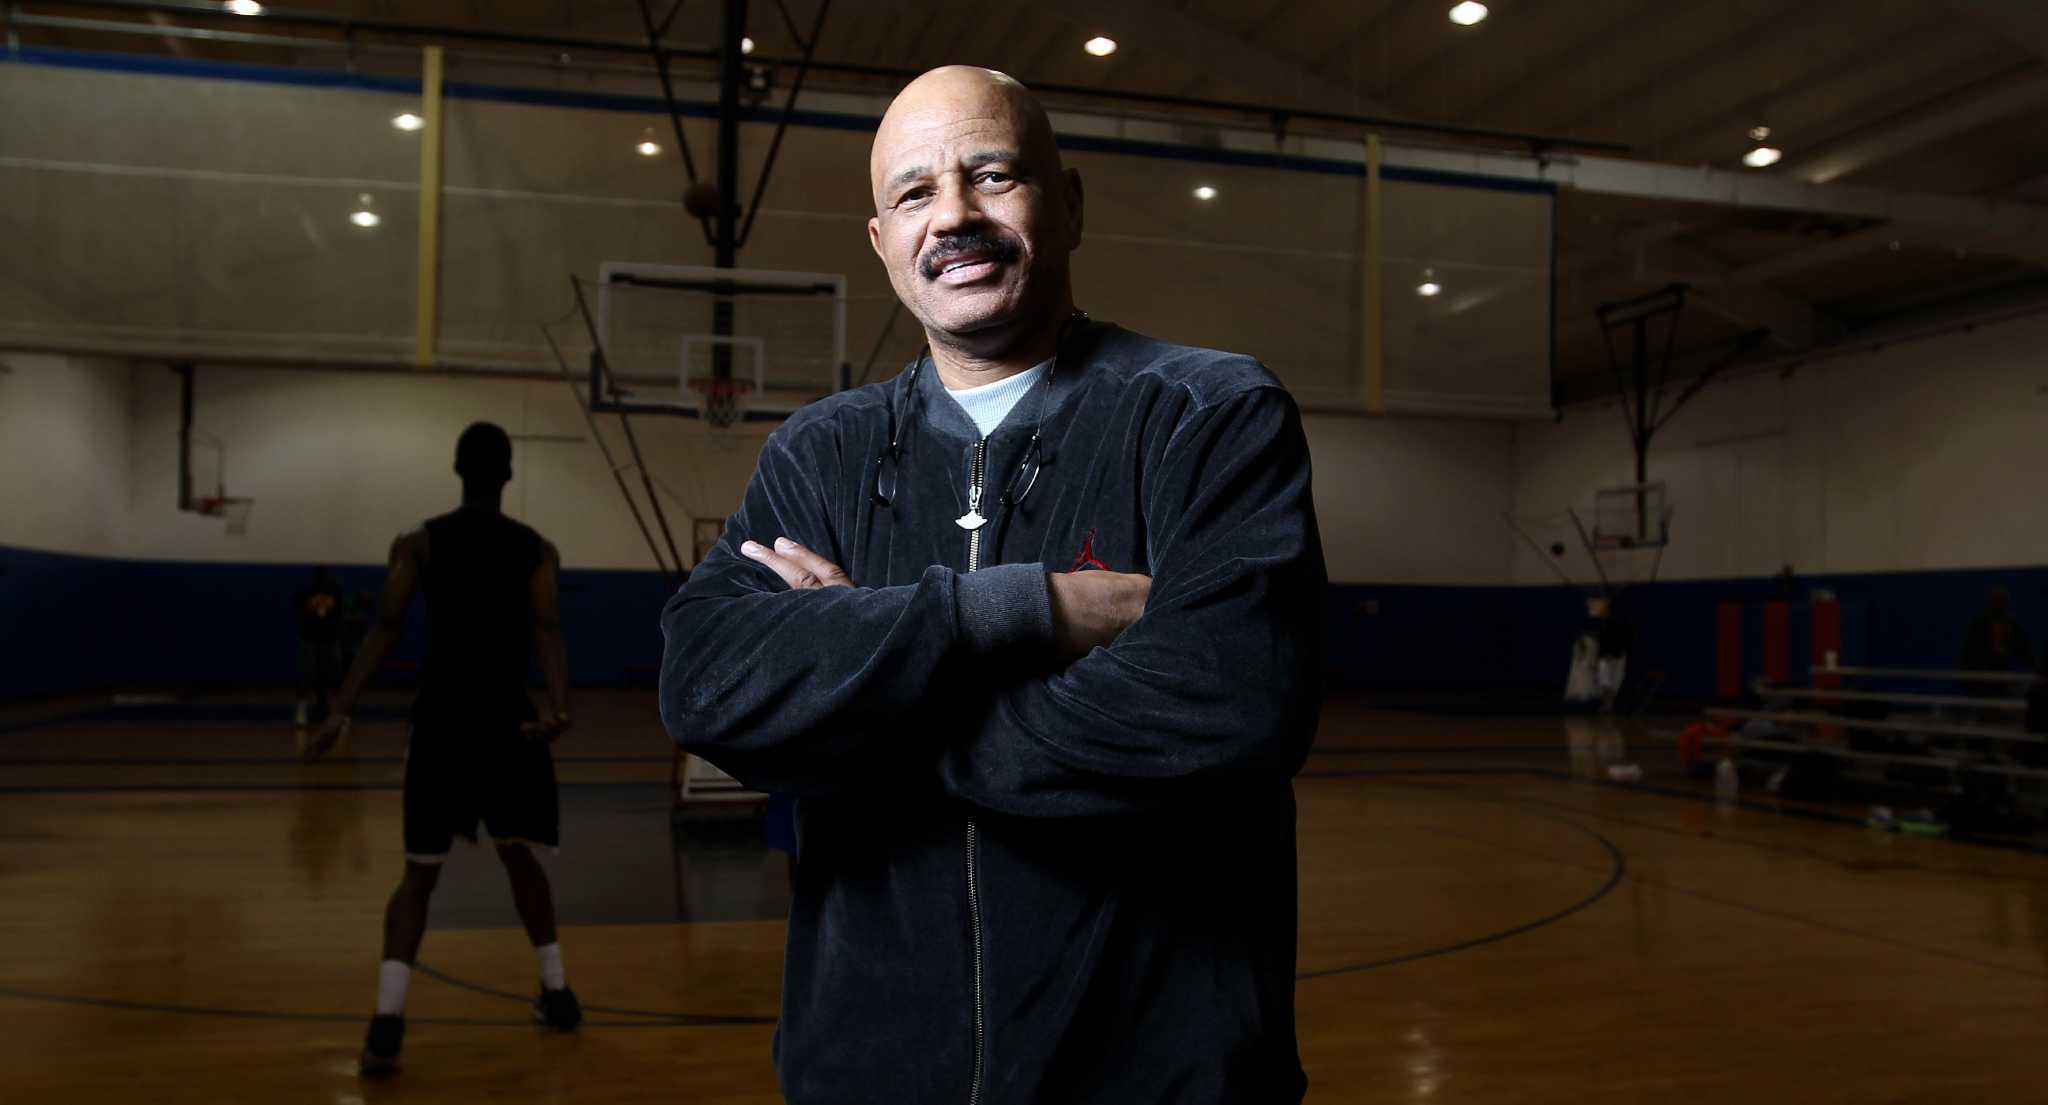 Jaguar Houston Central >> John Lucas: Playing forward his life lessons learned - Houston Chronicle